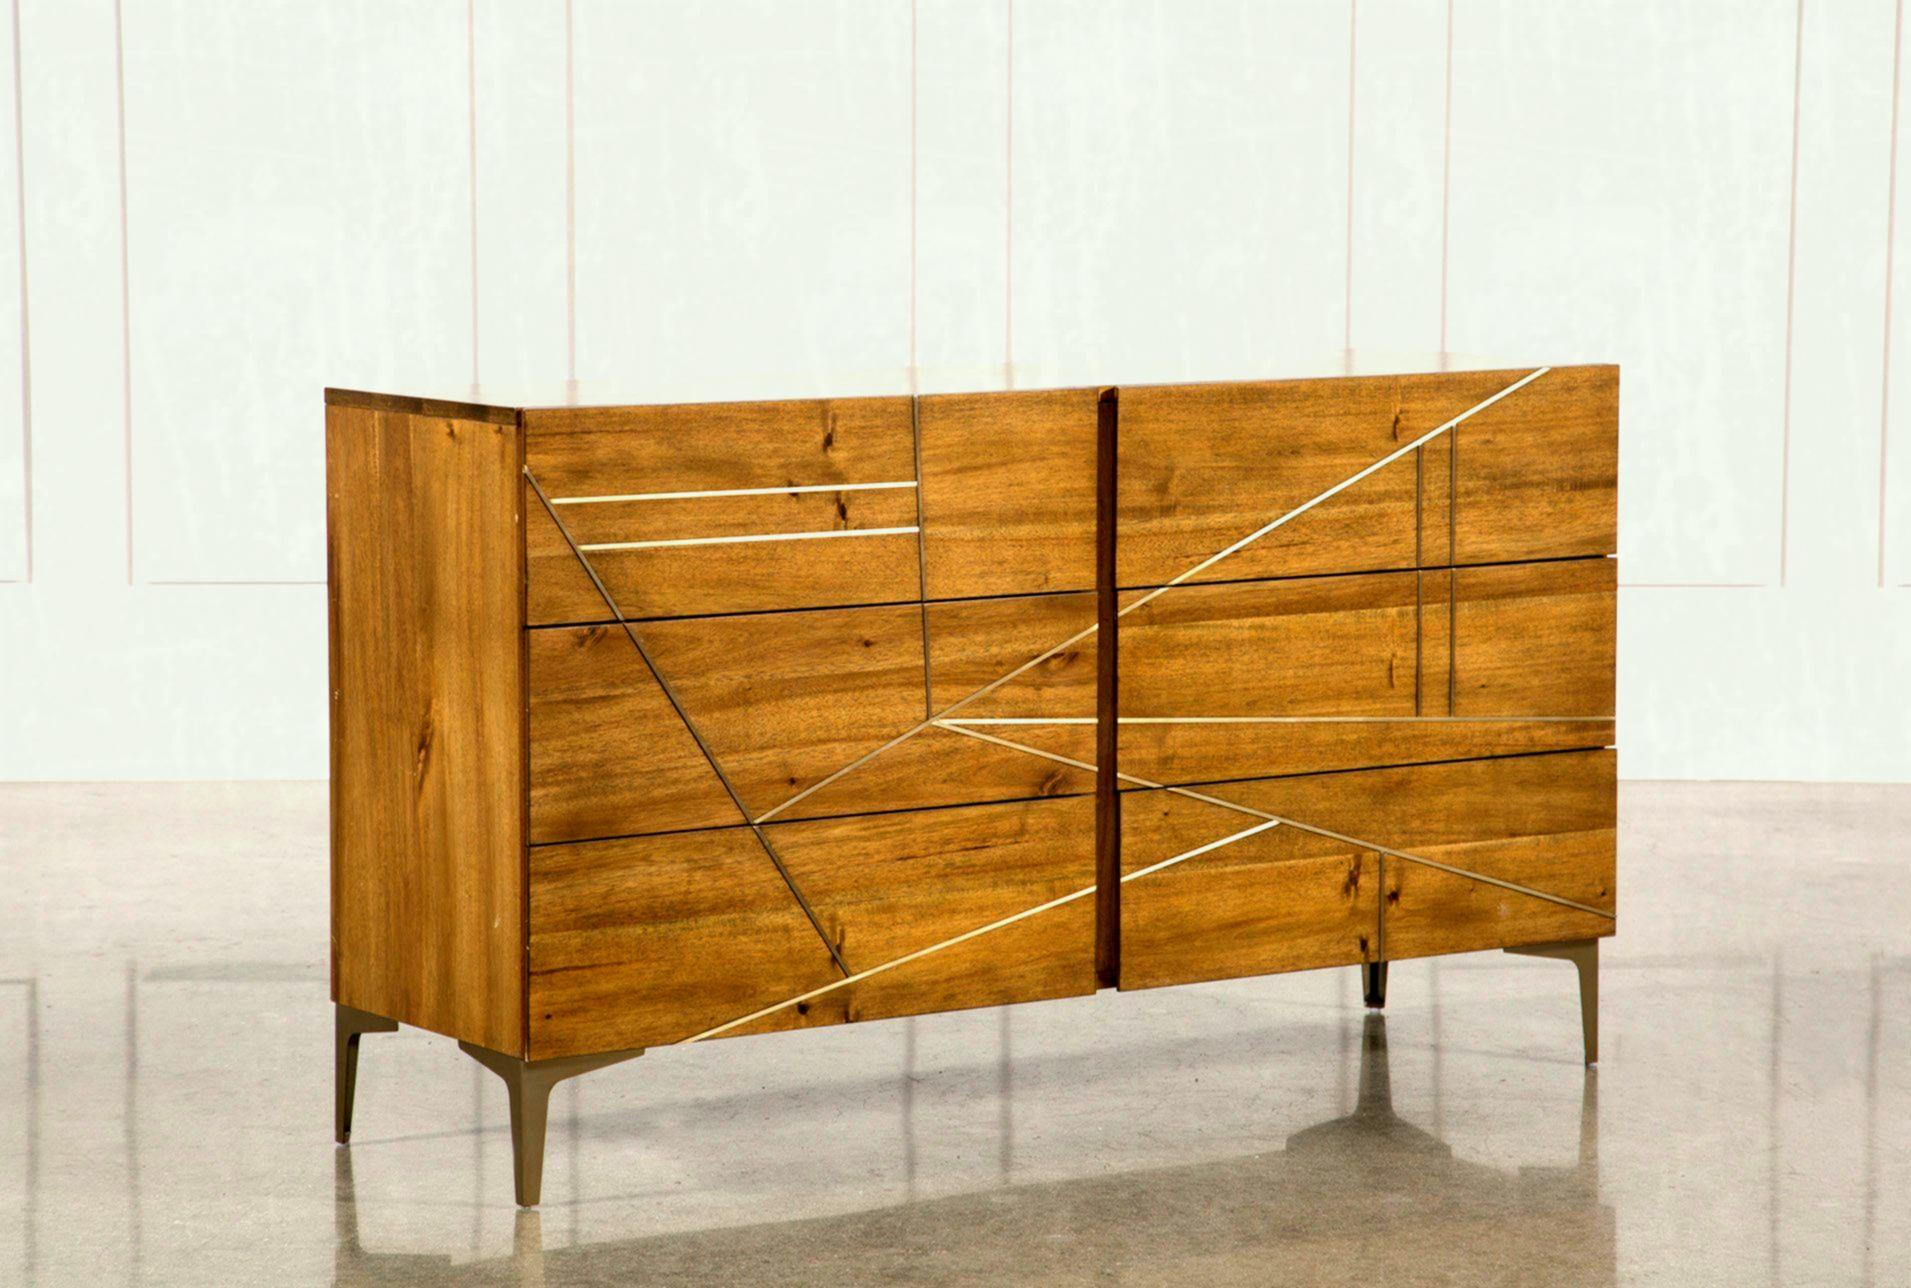 Mcdade Ash Sofa Living Spaces Lg – Garage Plans With Living Space In Mcdade Ash Sofa Chairs (Image 20 of 25)